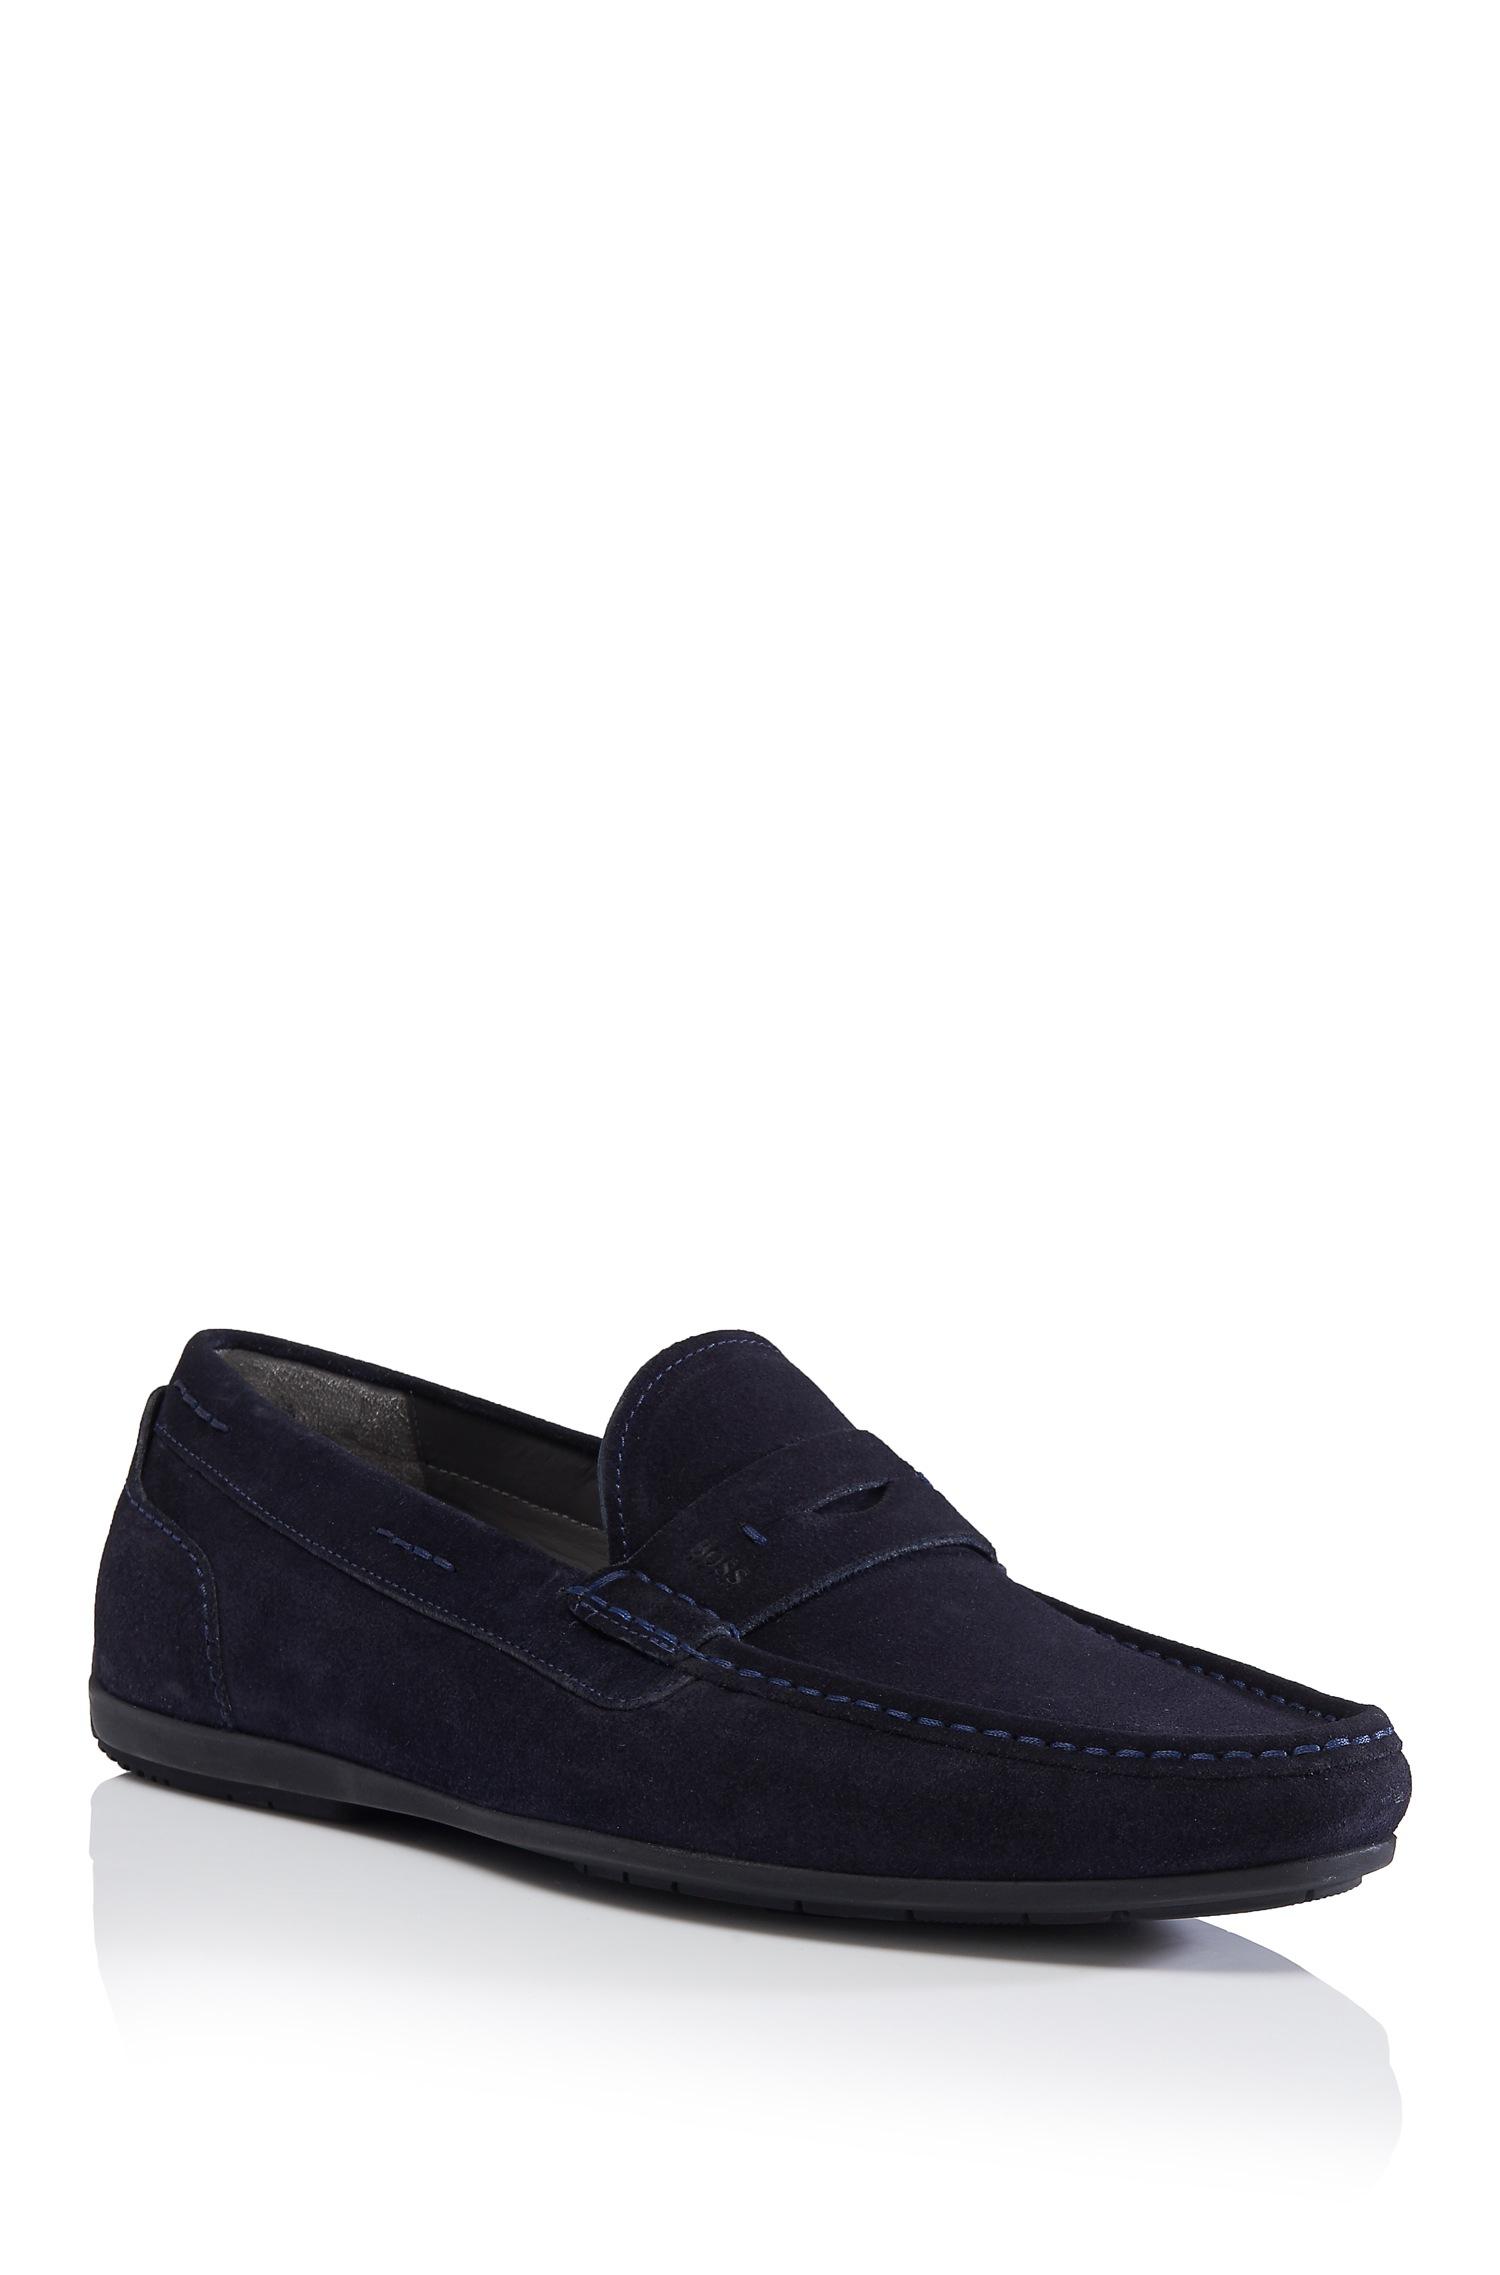 Men Armani Suede Moccasins Shoes Darkblue